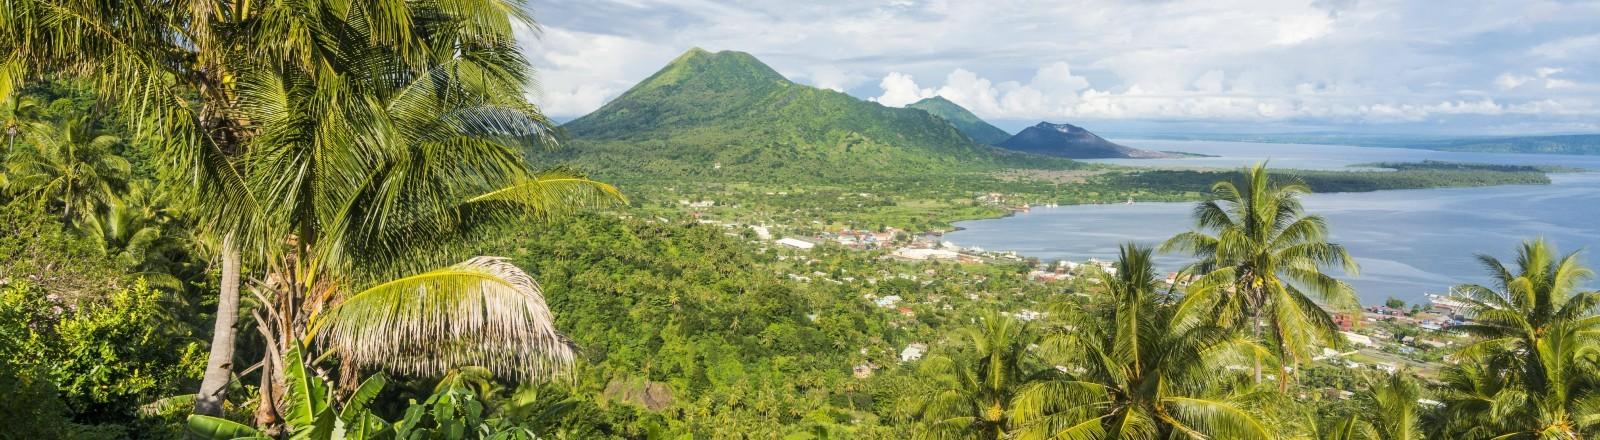 Papua-Neuguinea von oben.